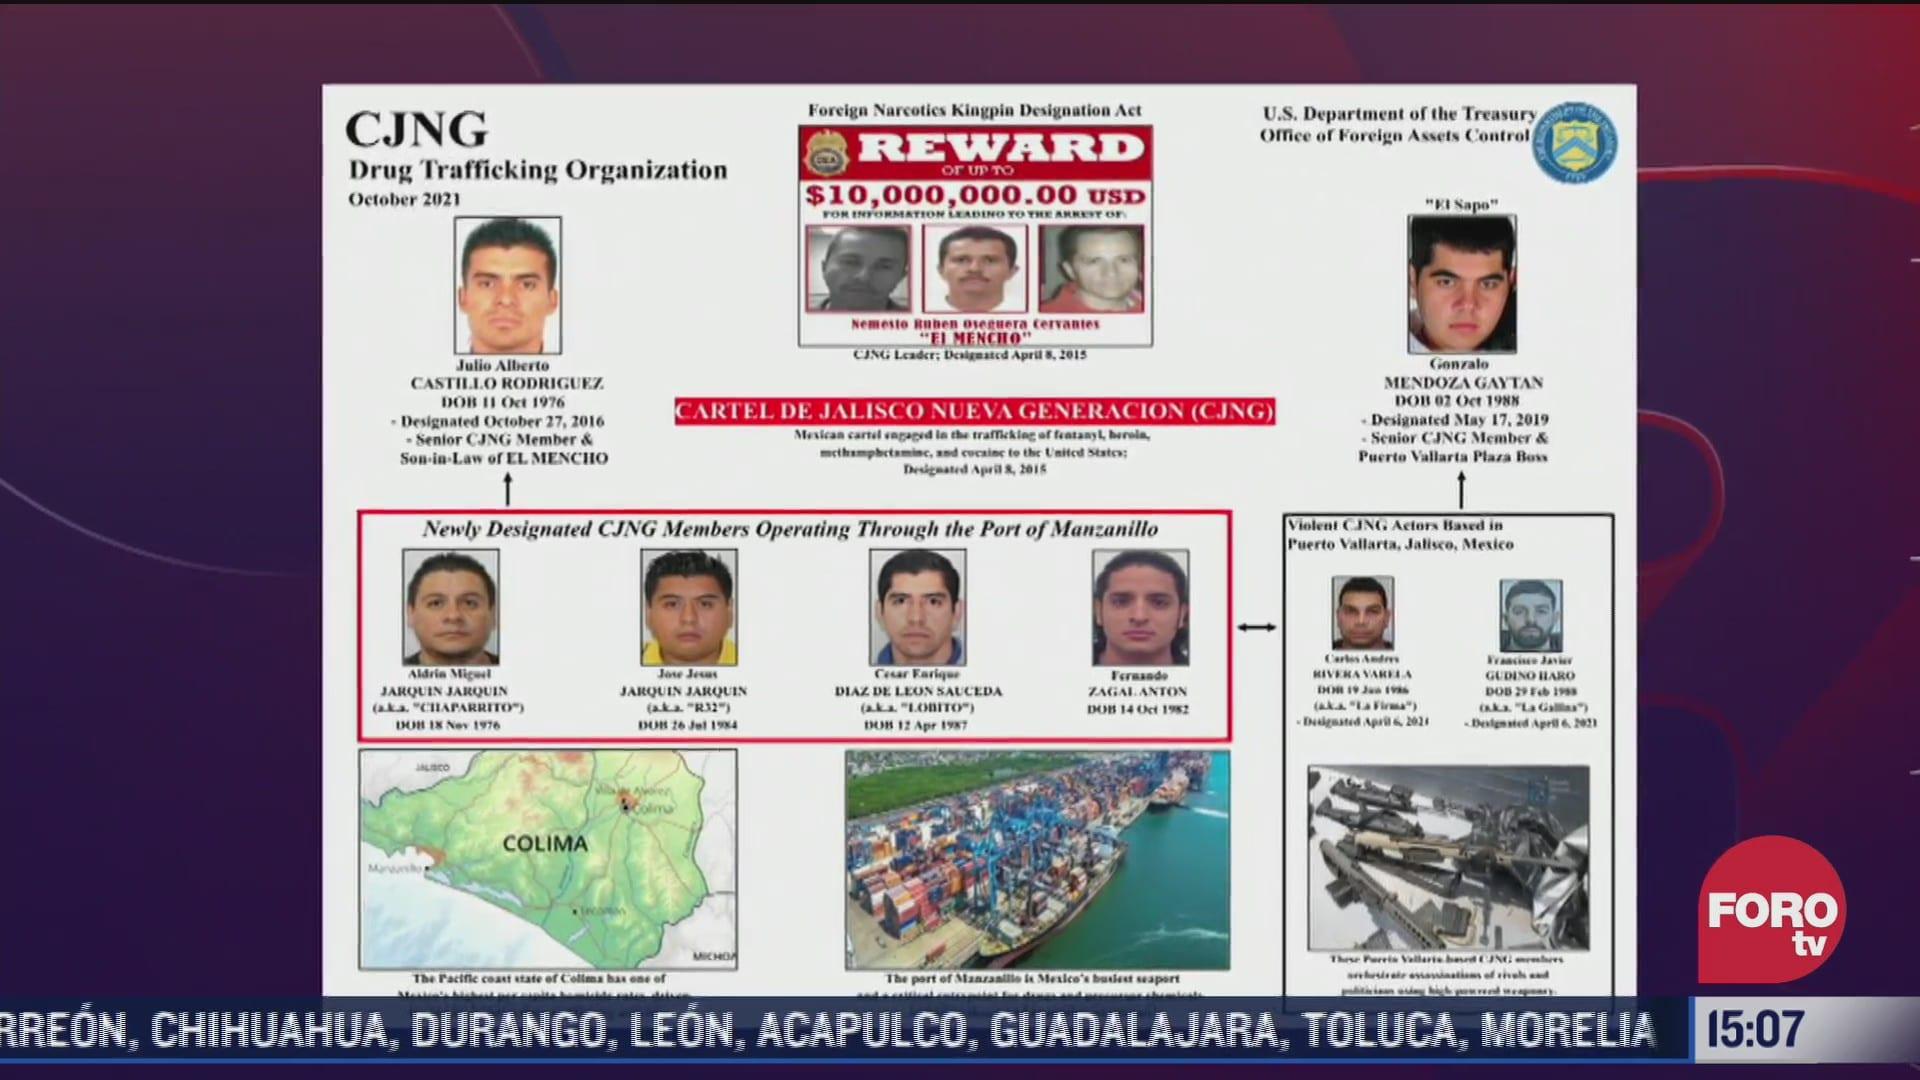 eeuu sanciona a integrantes del cartel jalisco nueva generacion